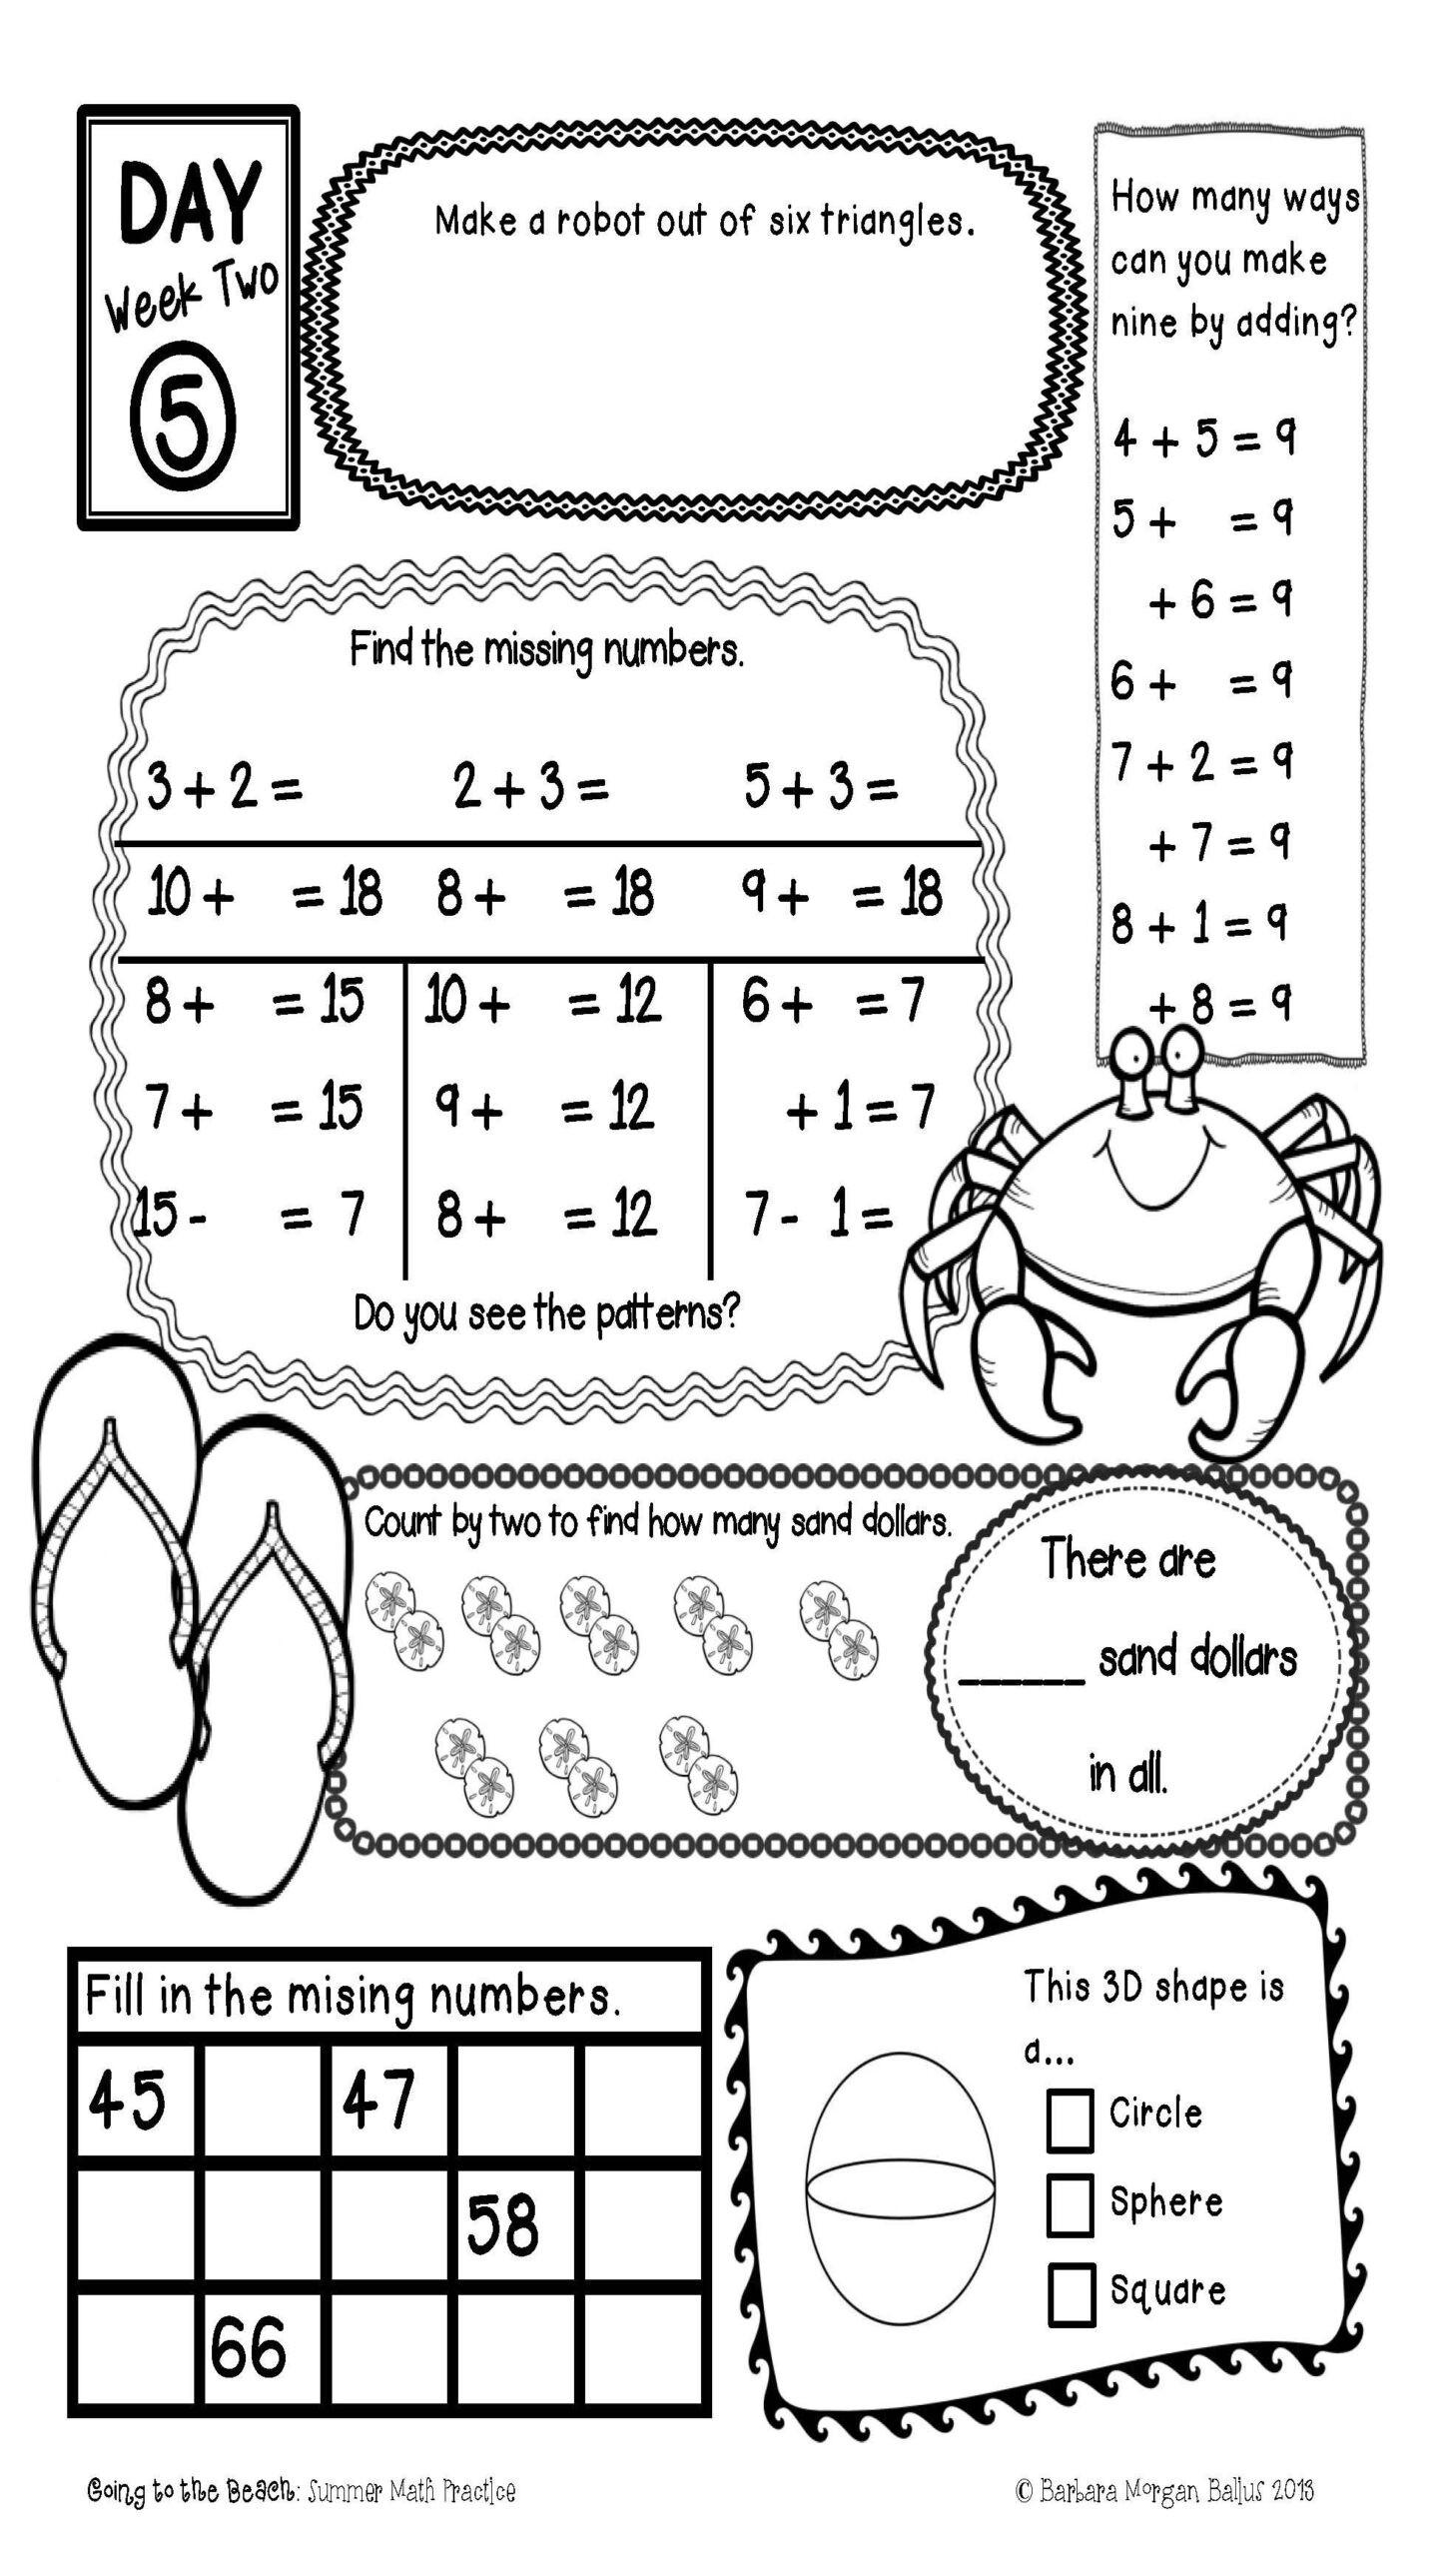 Unit Circle Practice Worksheet Homework Worksheets for 4th Grade Numeric Keypad Practice